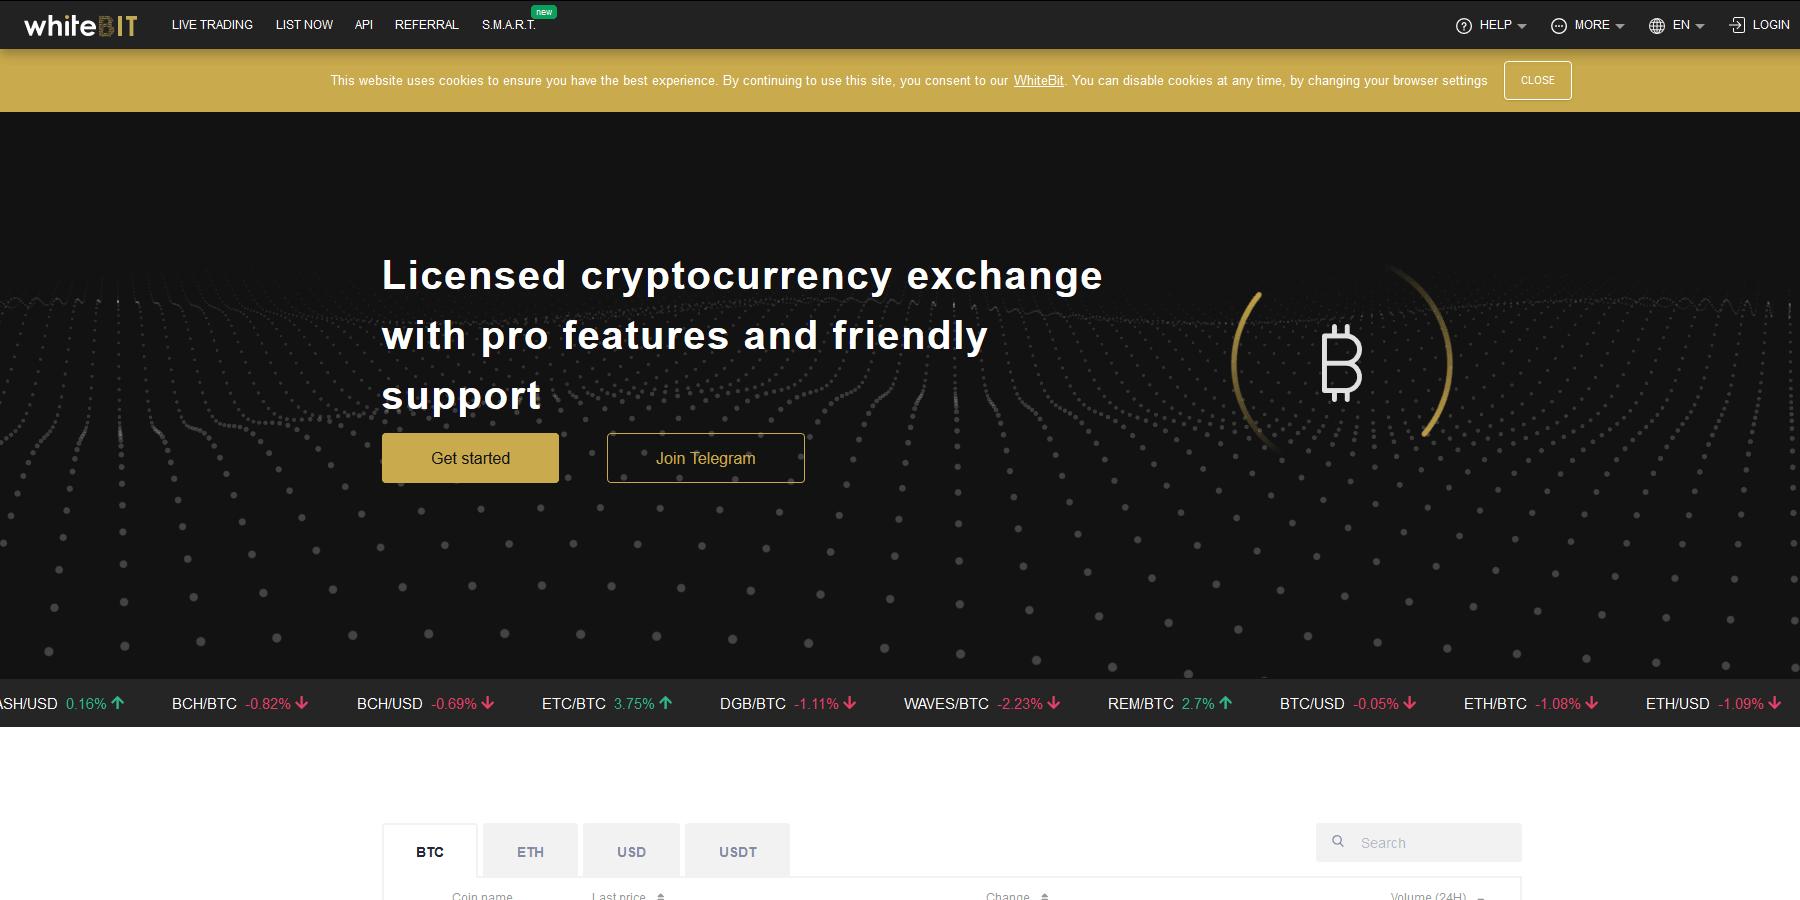 Acheter des cryptomonnaies chez WhiteBIT